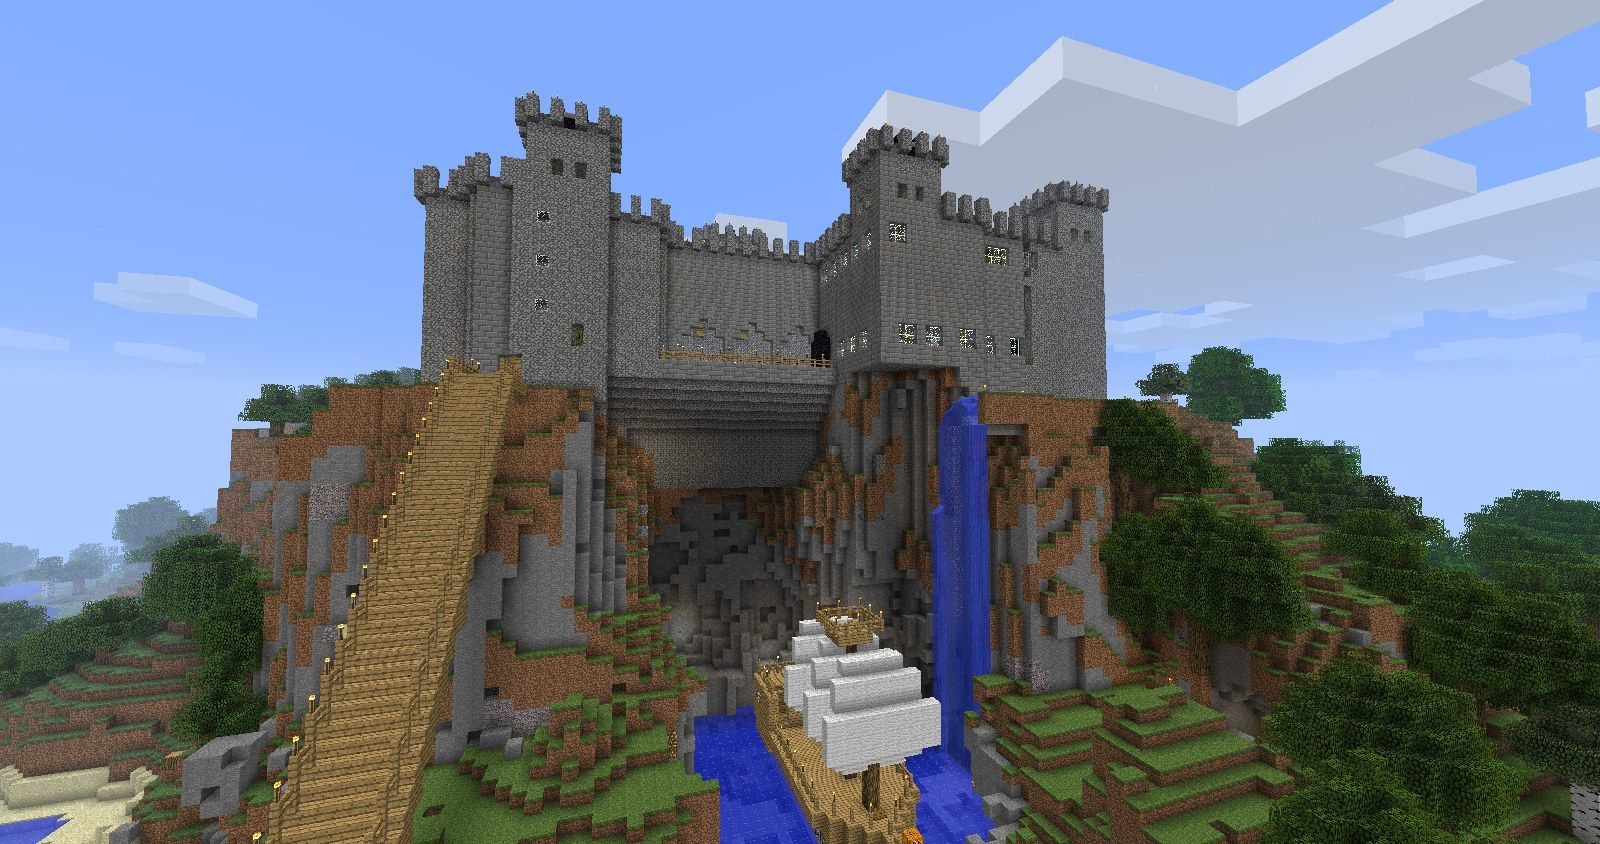 minecraft castles | minecraft castle | minecraft ...